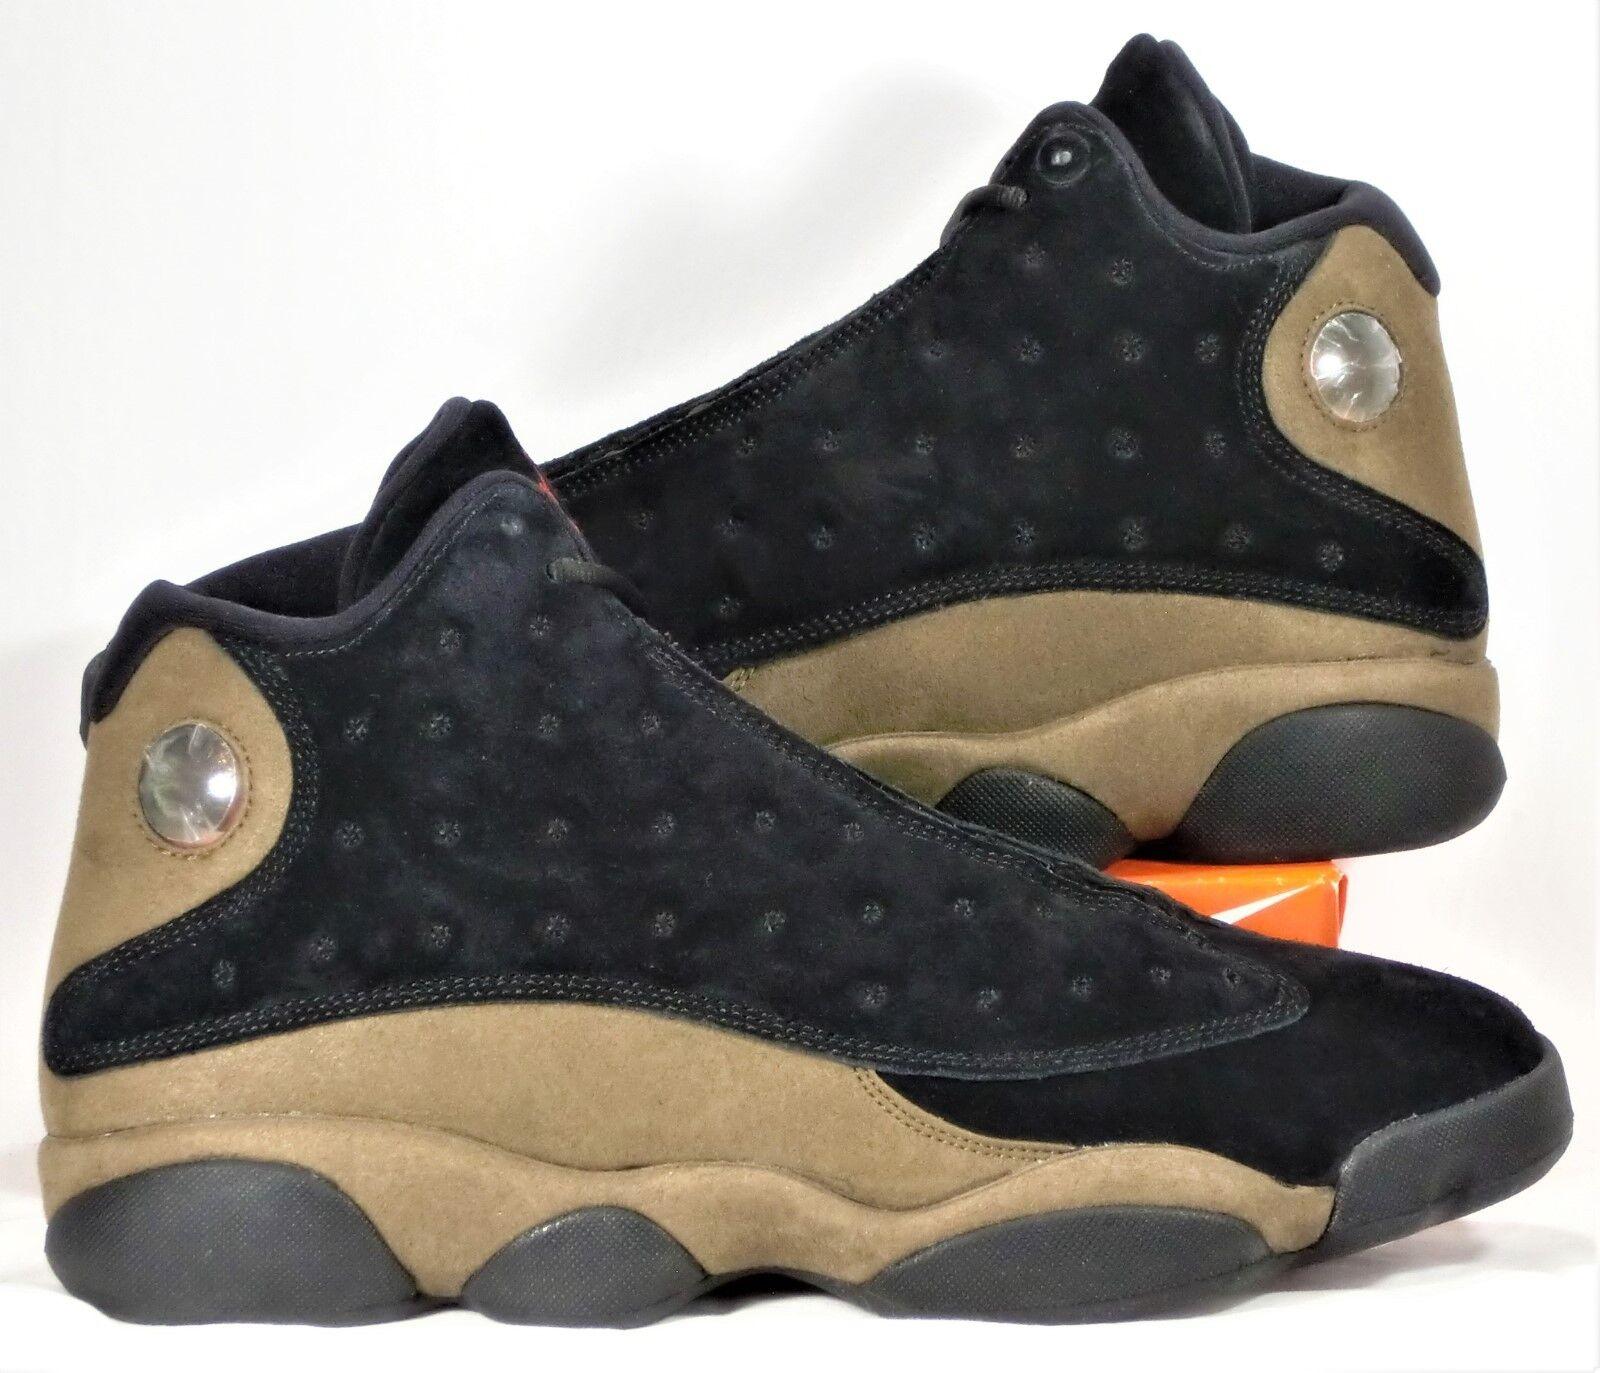 Nike air jordan 13 xiii retrò nero & palestra red & olive sz nuovi 414571 006